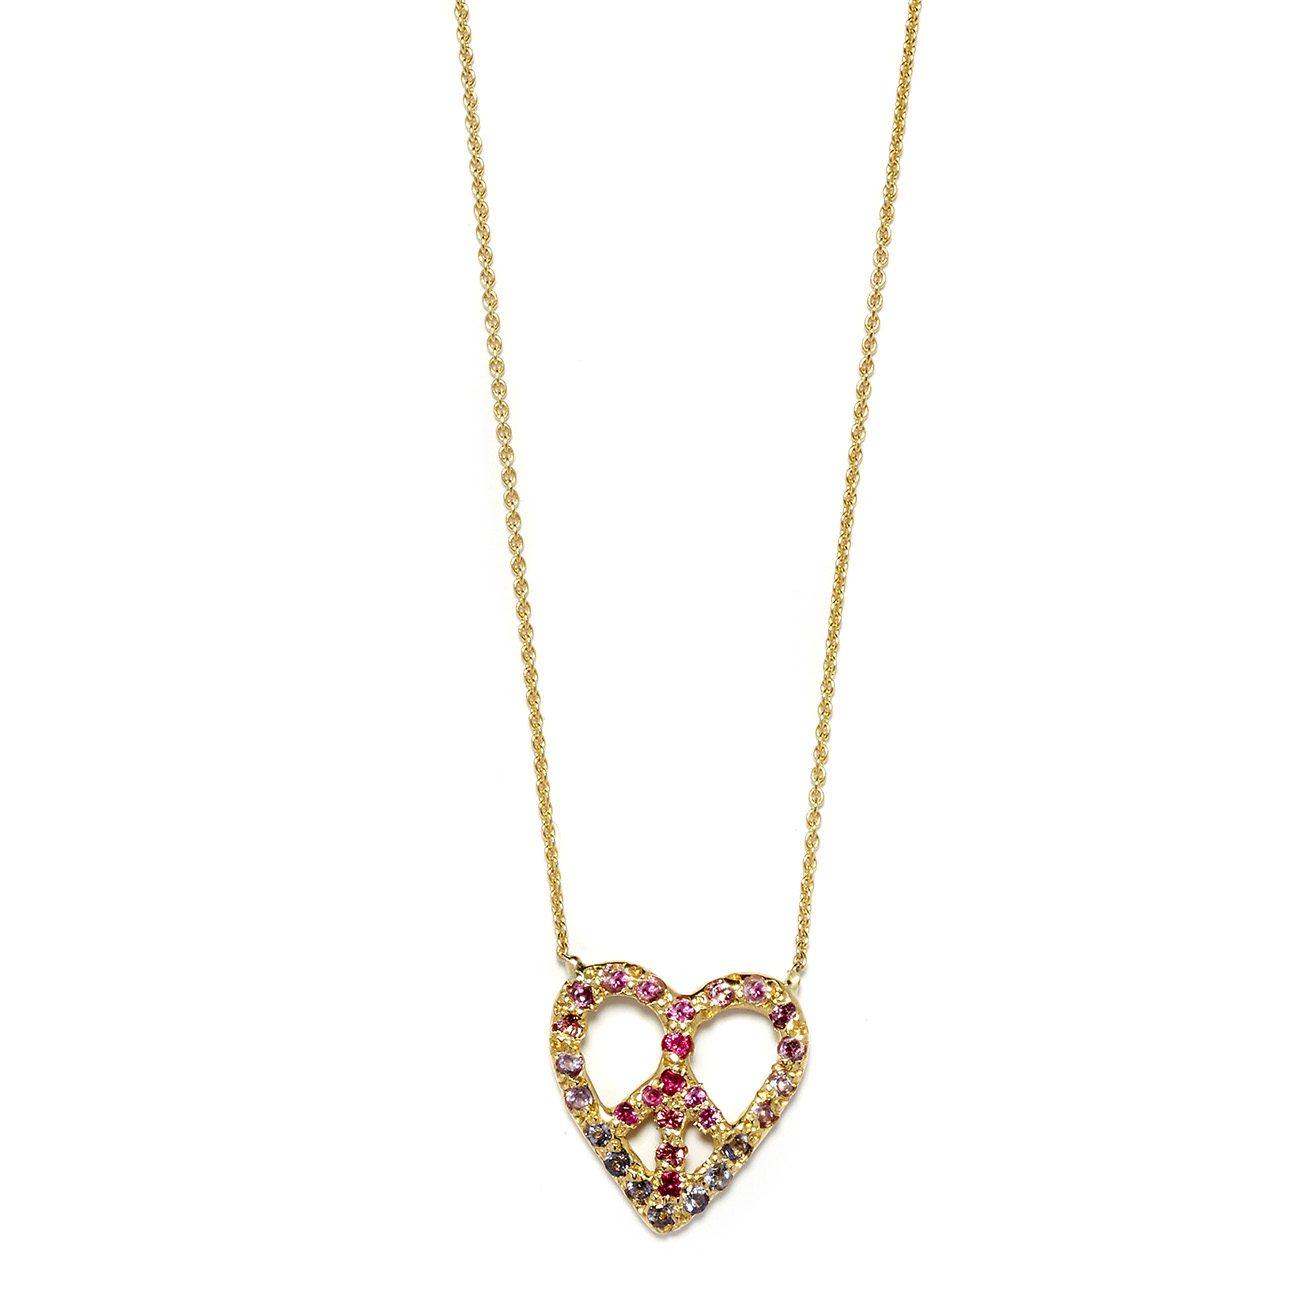 Elisa Solomon - Yellow Gold Peace Heart Necklace Pinks